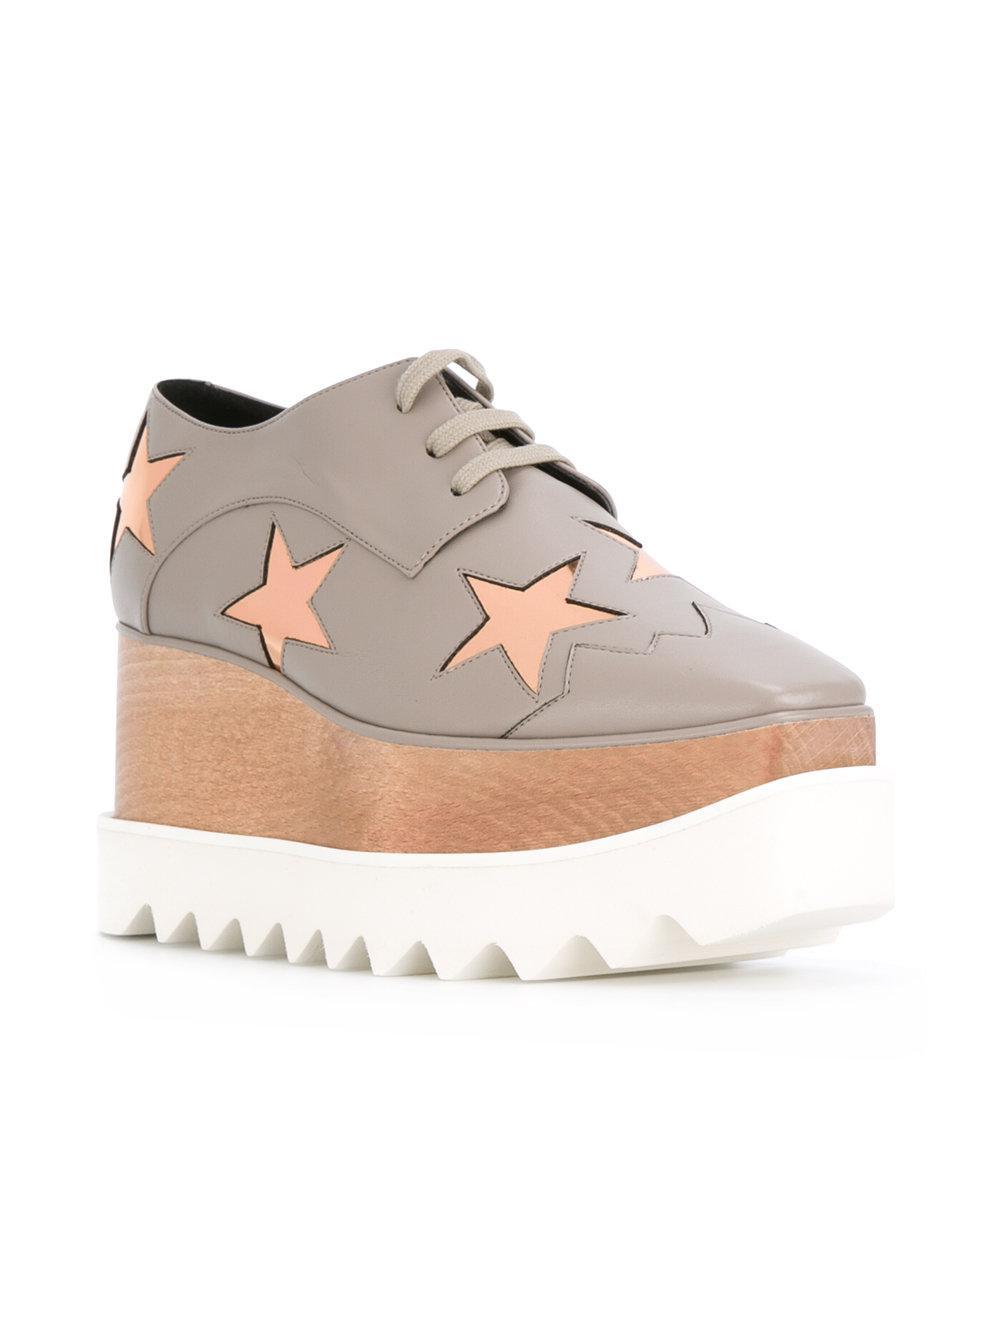 Stella McCartney Leather Star Patch Platform Trainers in Grey (Grey)